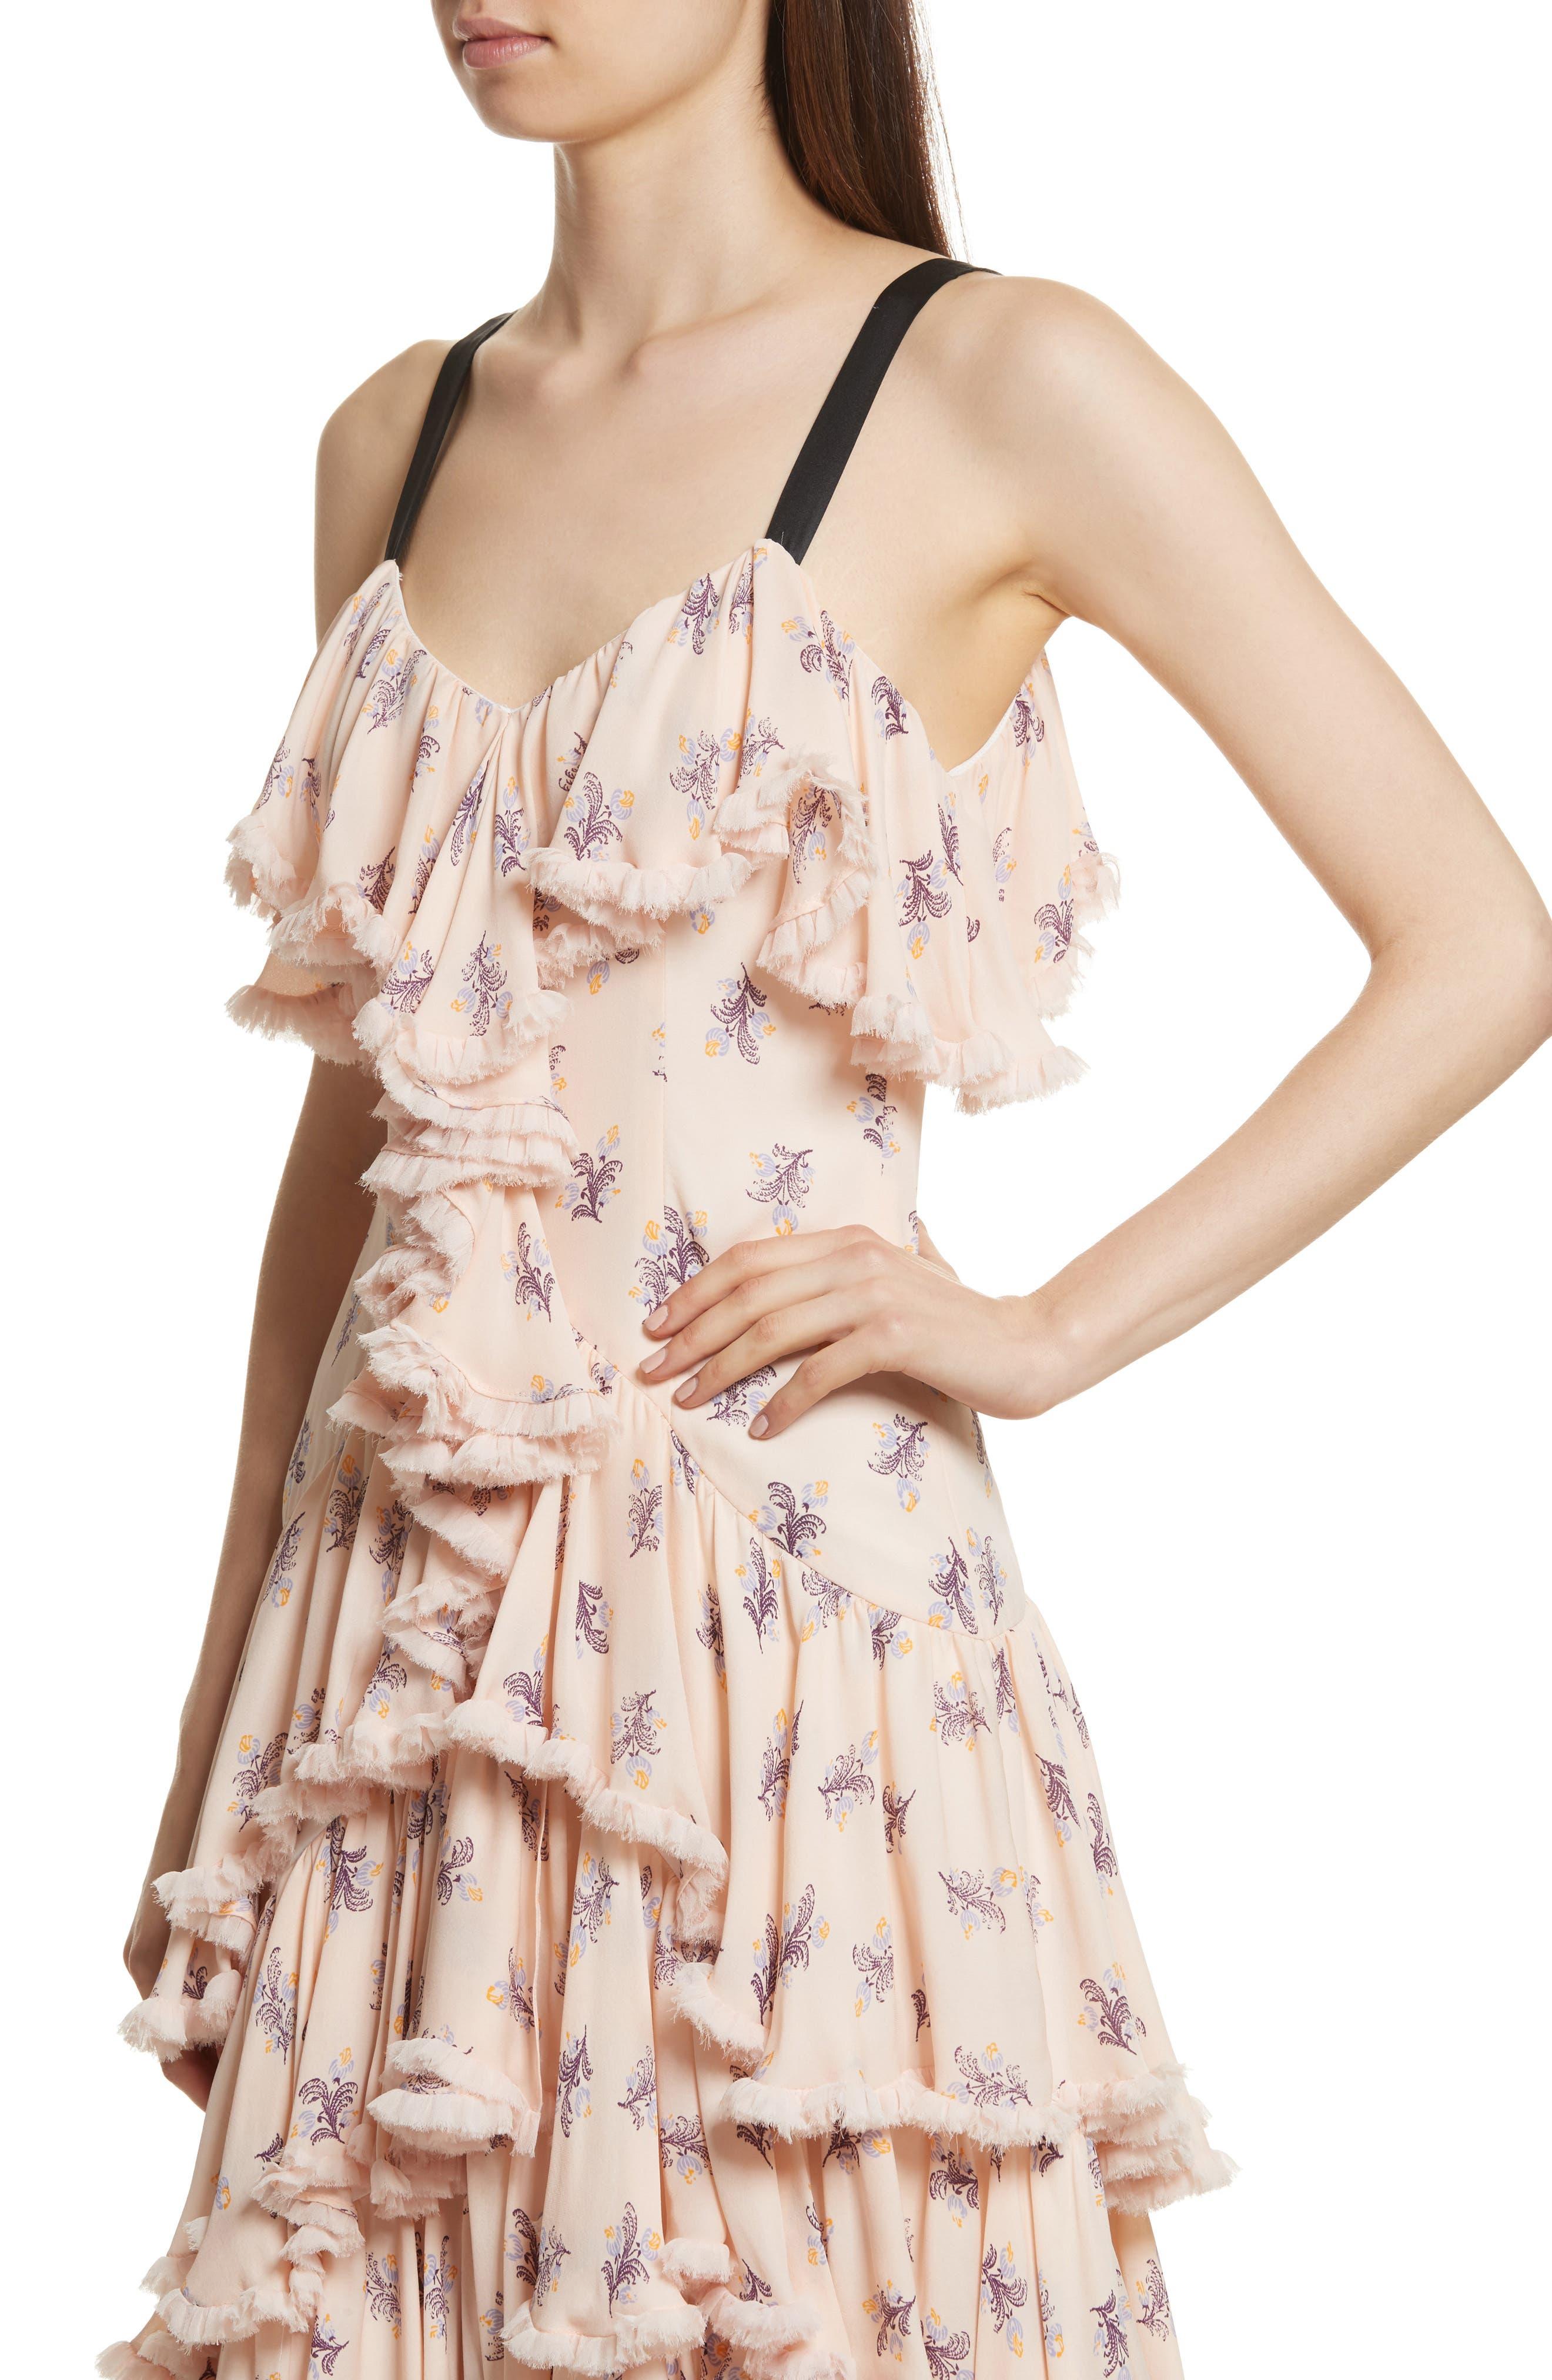 Edie Floral Print Tiered Silk Dress,                             Alternate thumbnail 4, color,                             699